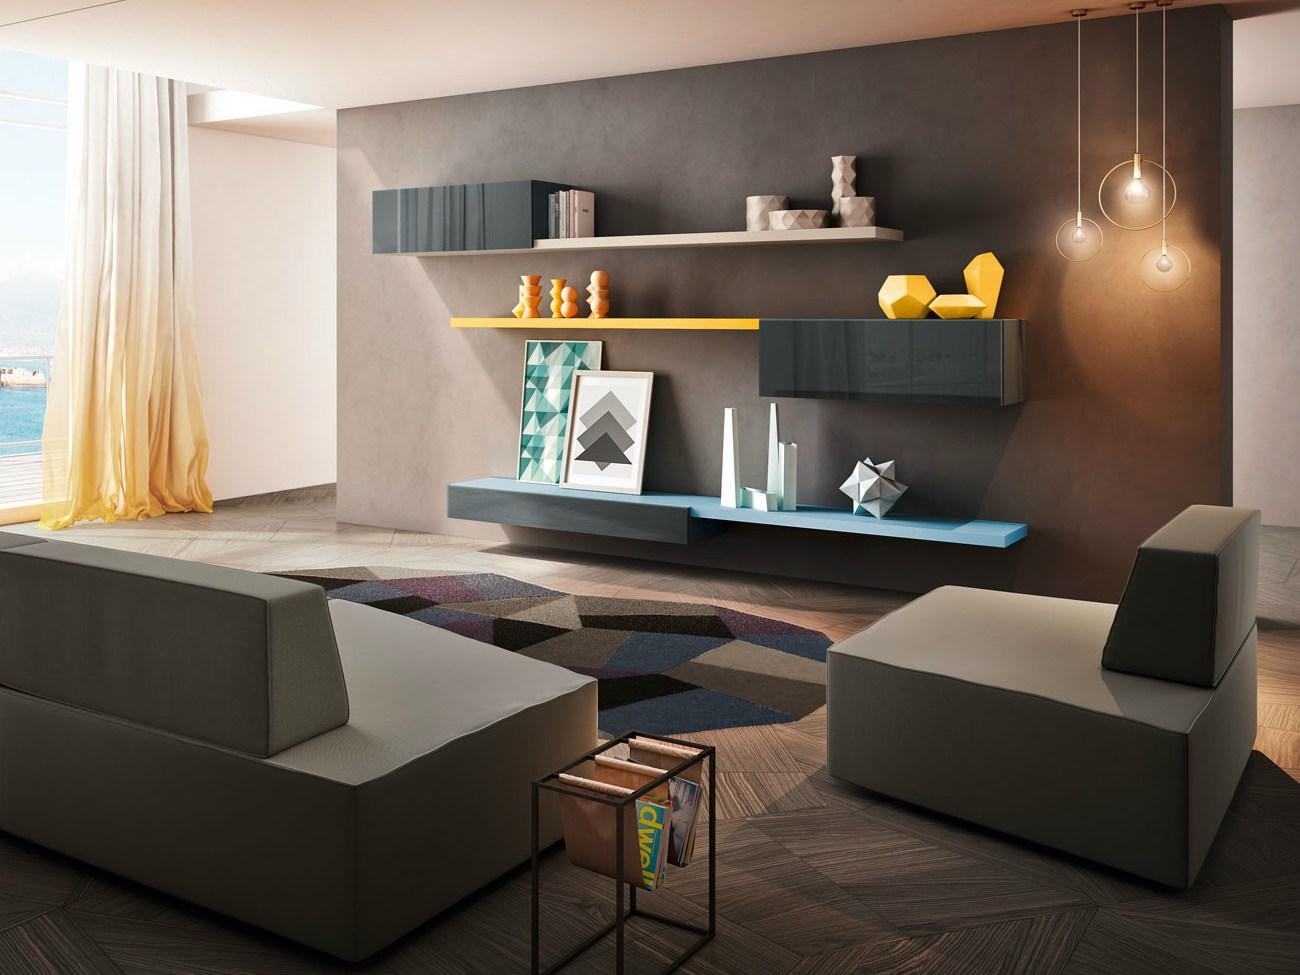 meubles lago versusmobili. Black Bedroom Furniture Sets. Home Design Ideas